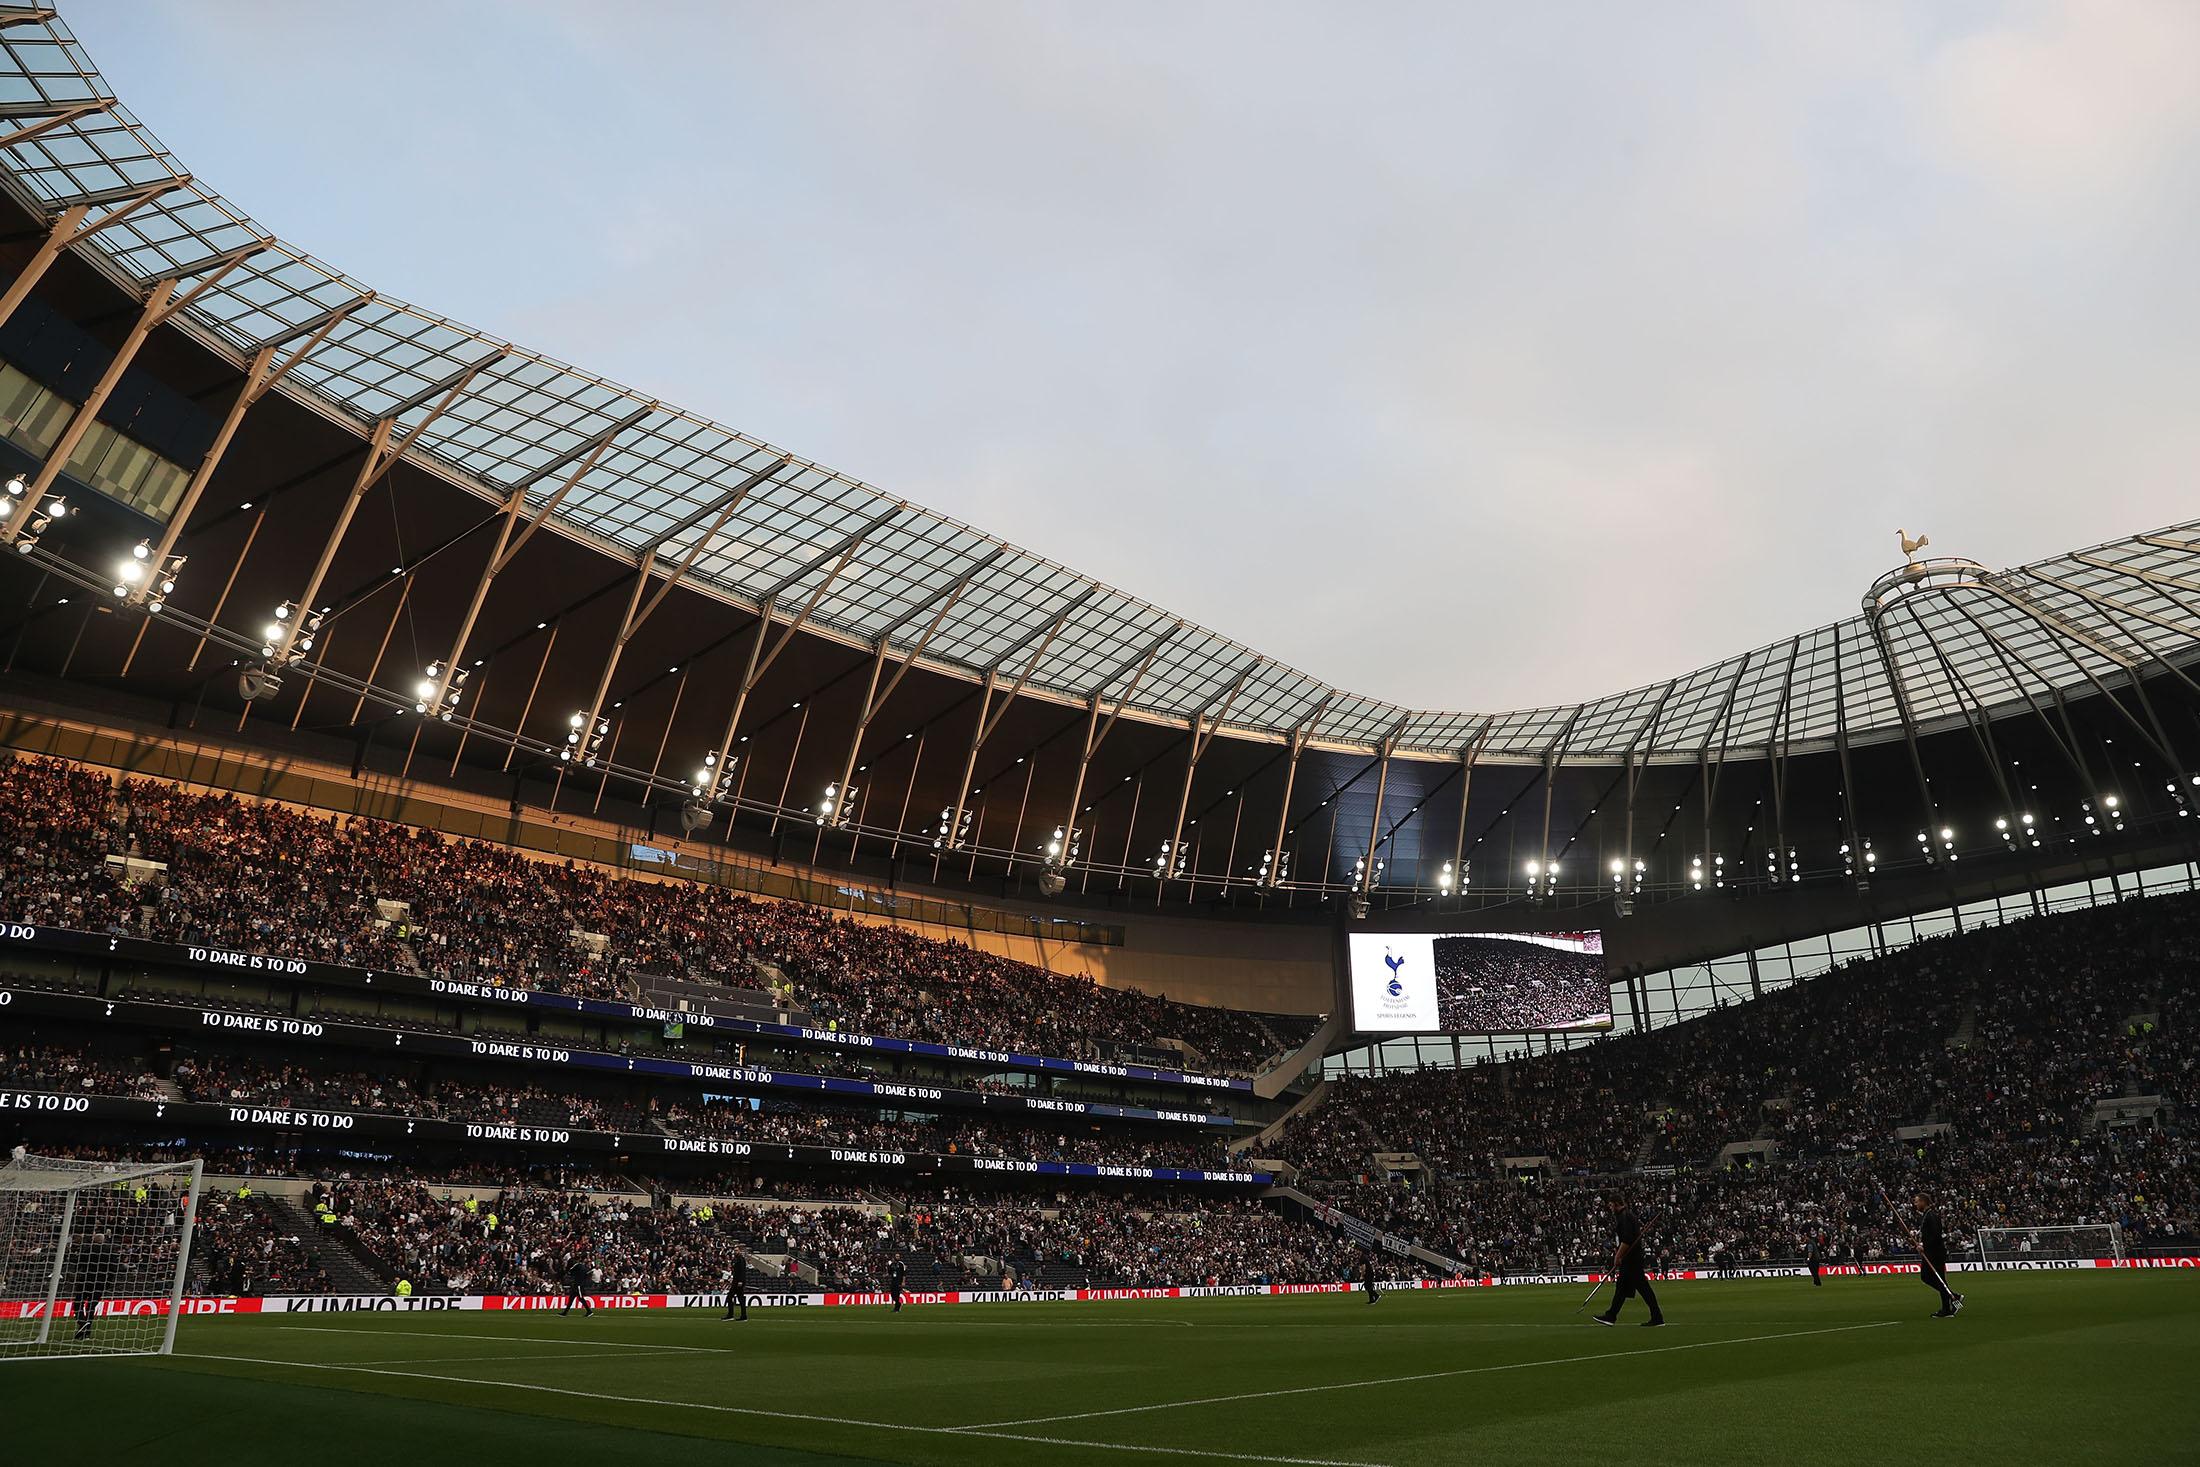 Tottenham Stadium Follows Us Financing Model Bloomberg